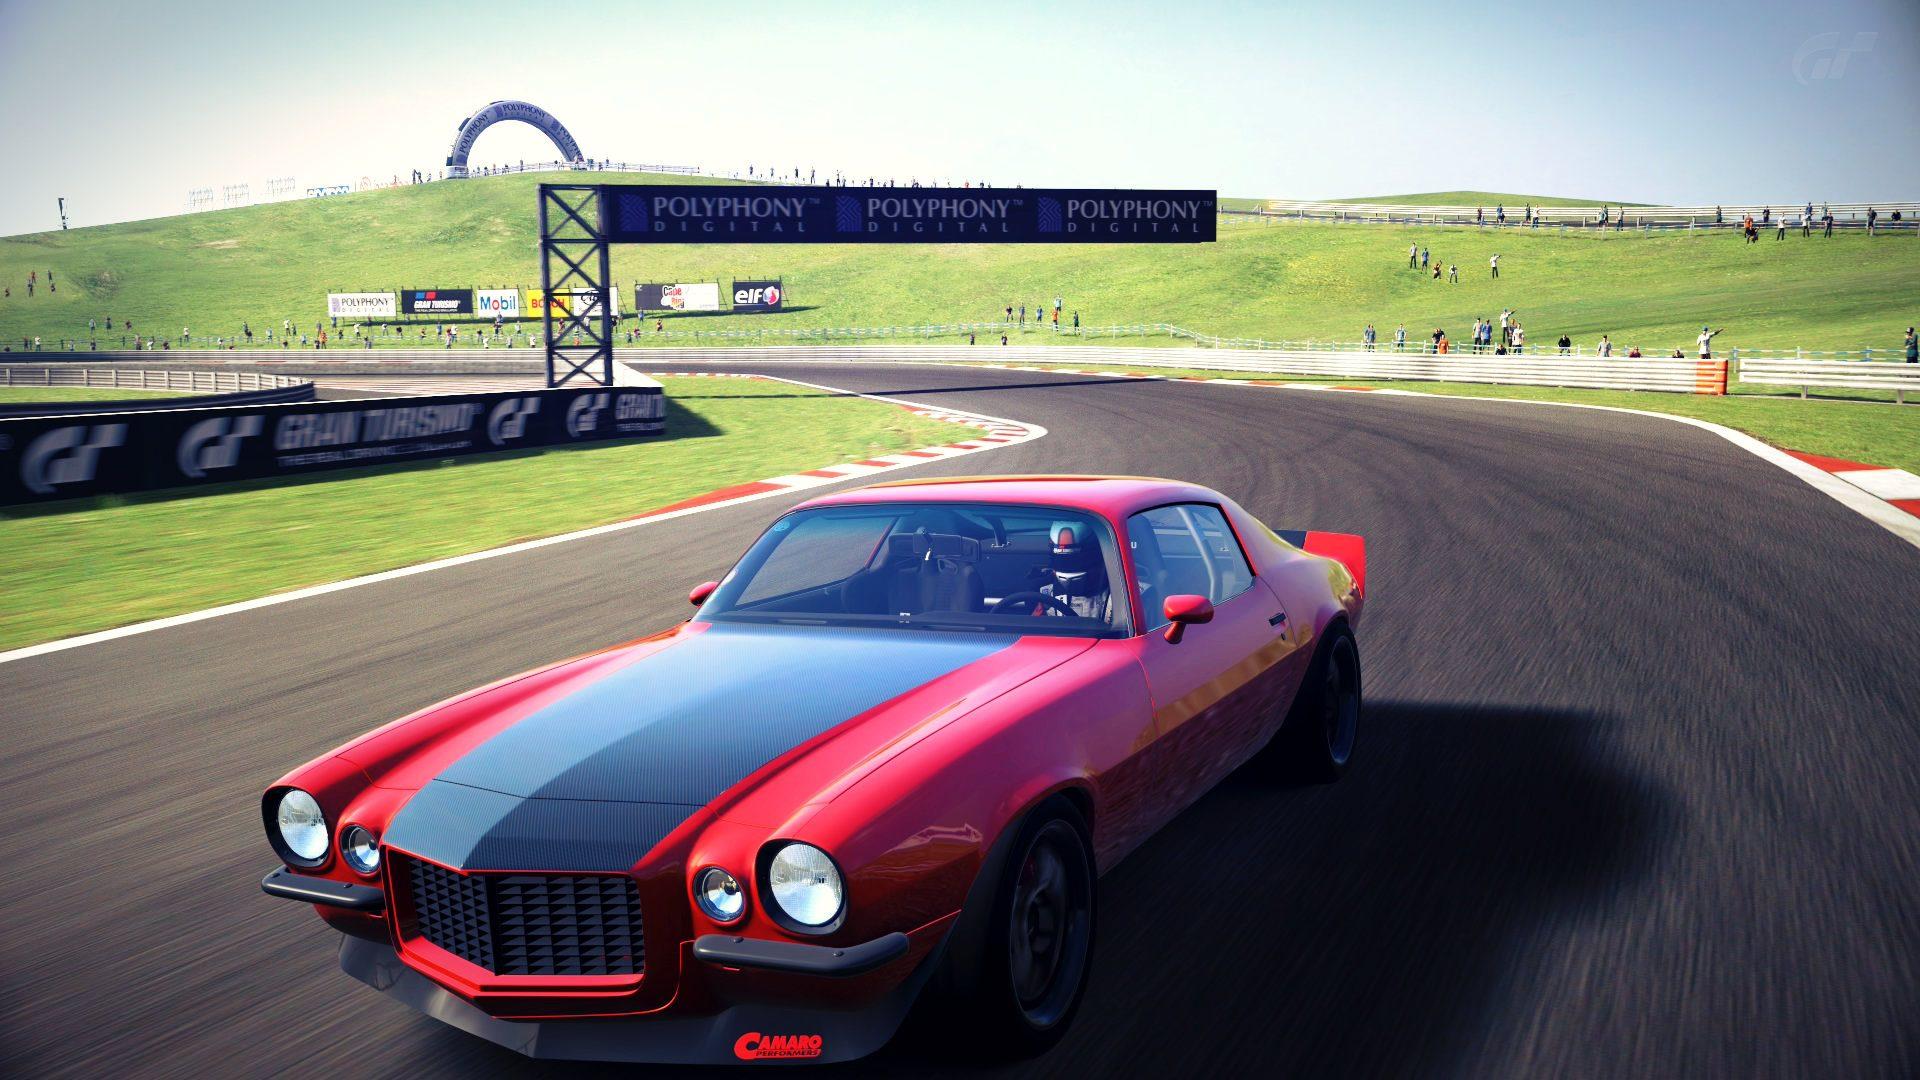 GT6 - Pozzi Camaro on Cape Ring.jpg